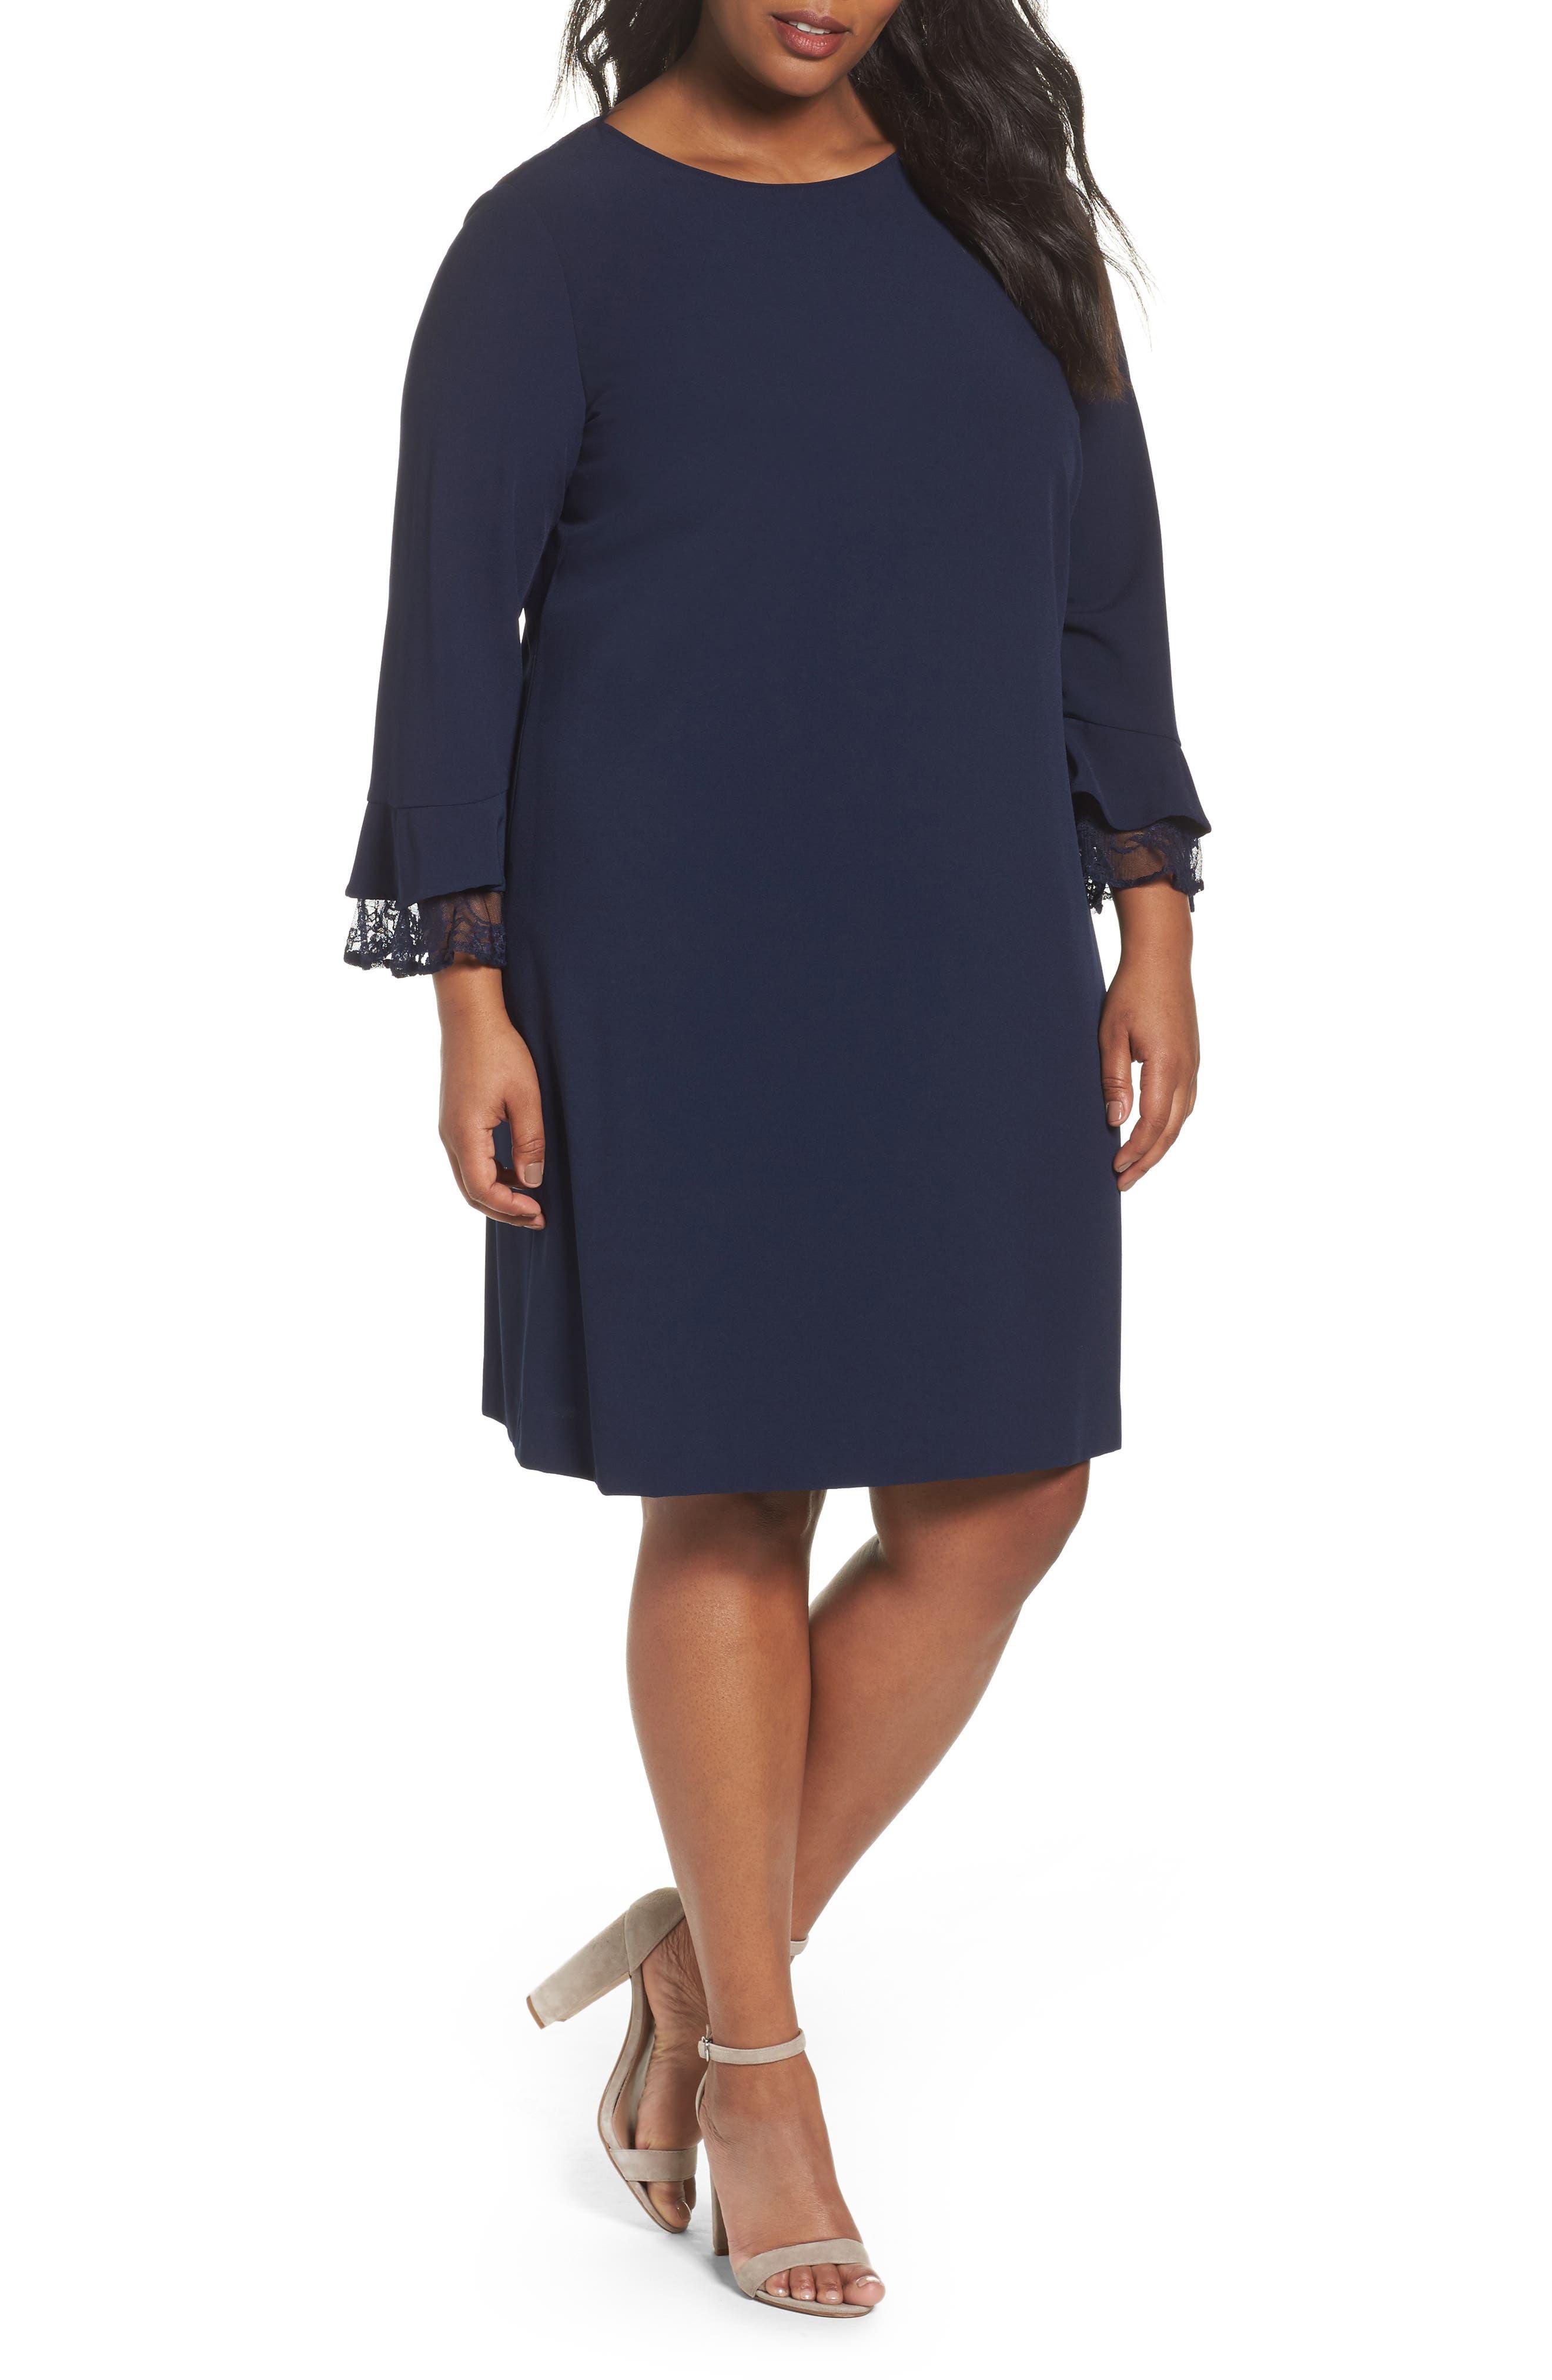 Tahari Lace Trim Shift Dress (Plus Size)